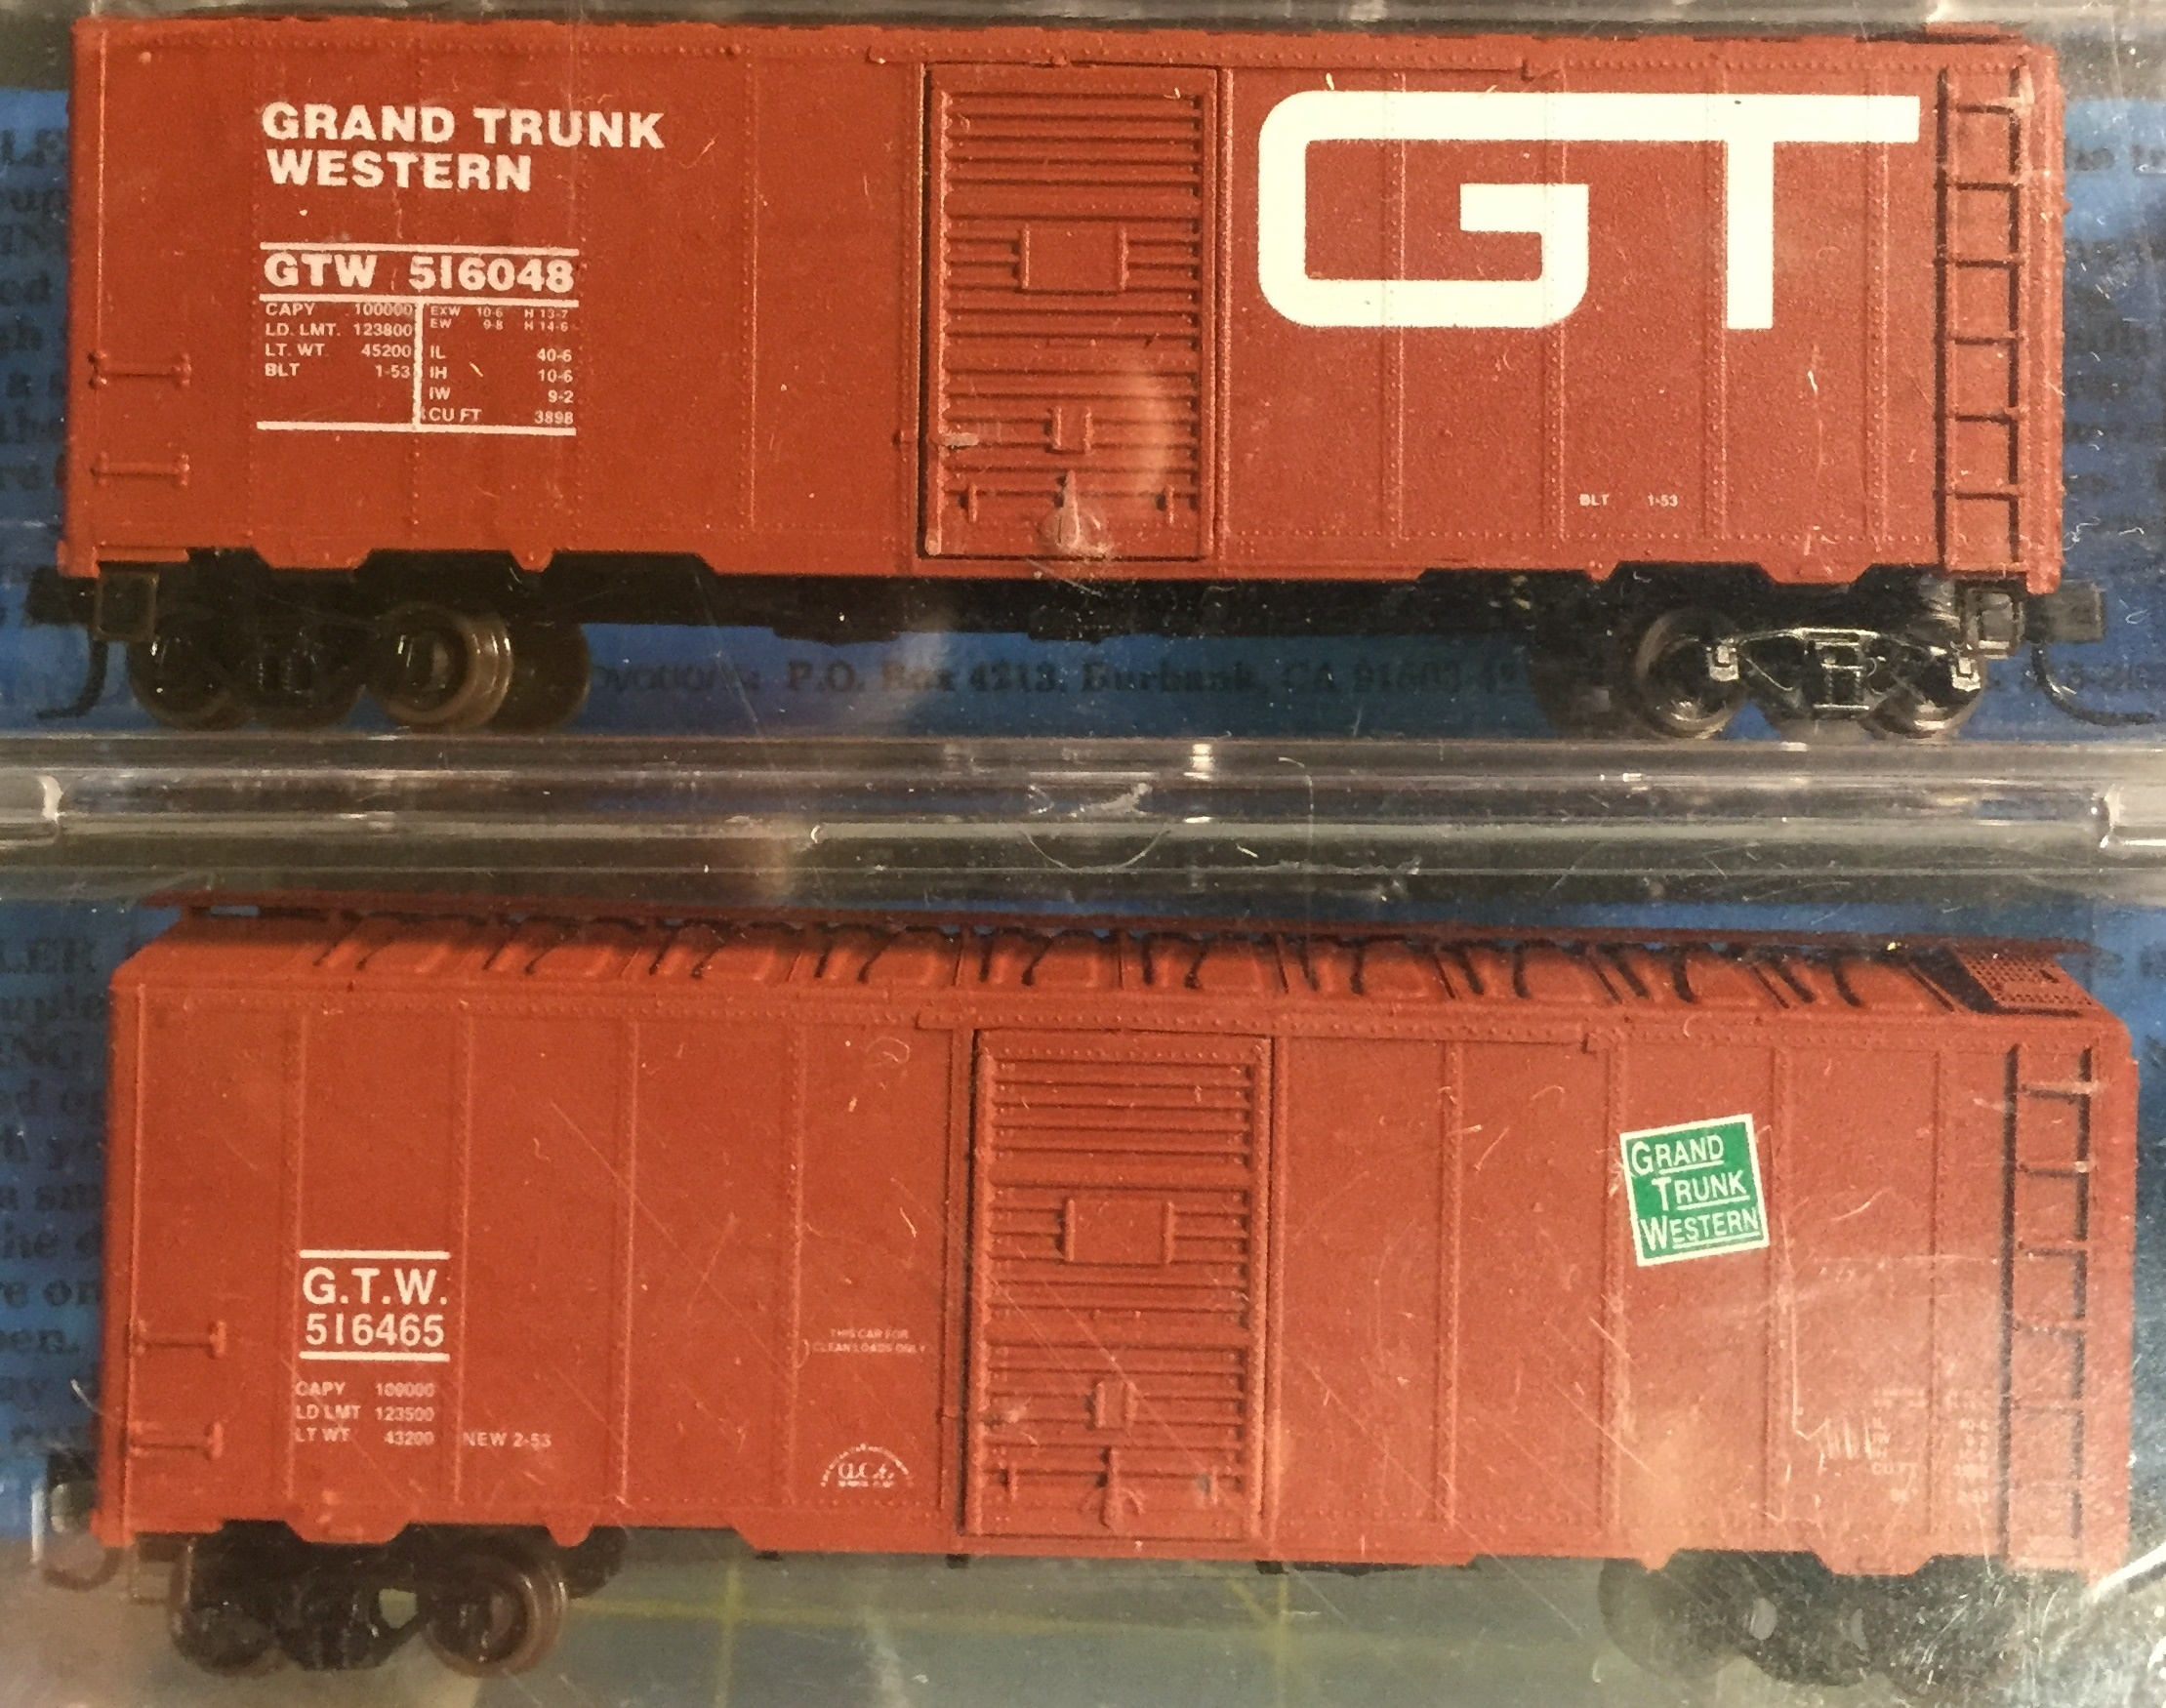 N Scale - Deluxe Innovations - 142102 - Boxcar, 40 Foot, AAR 1944 - Grand Trunk Western - 516048, 516465